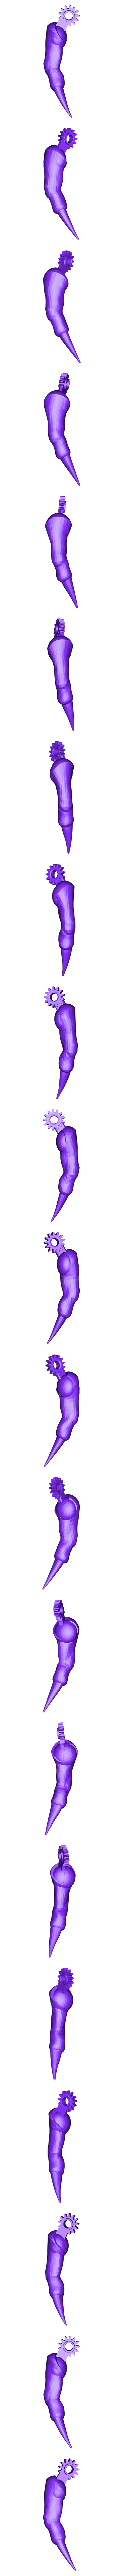 right thumb 2 print.stl Download free STL file GADGET the robotic Gremlin • 3D printing object, atarka3